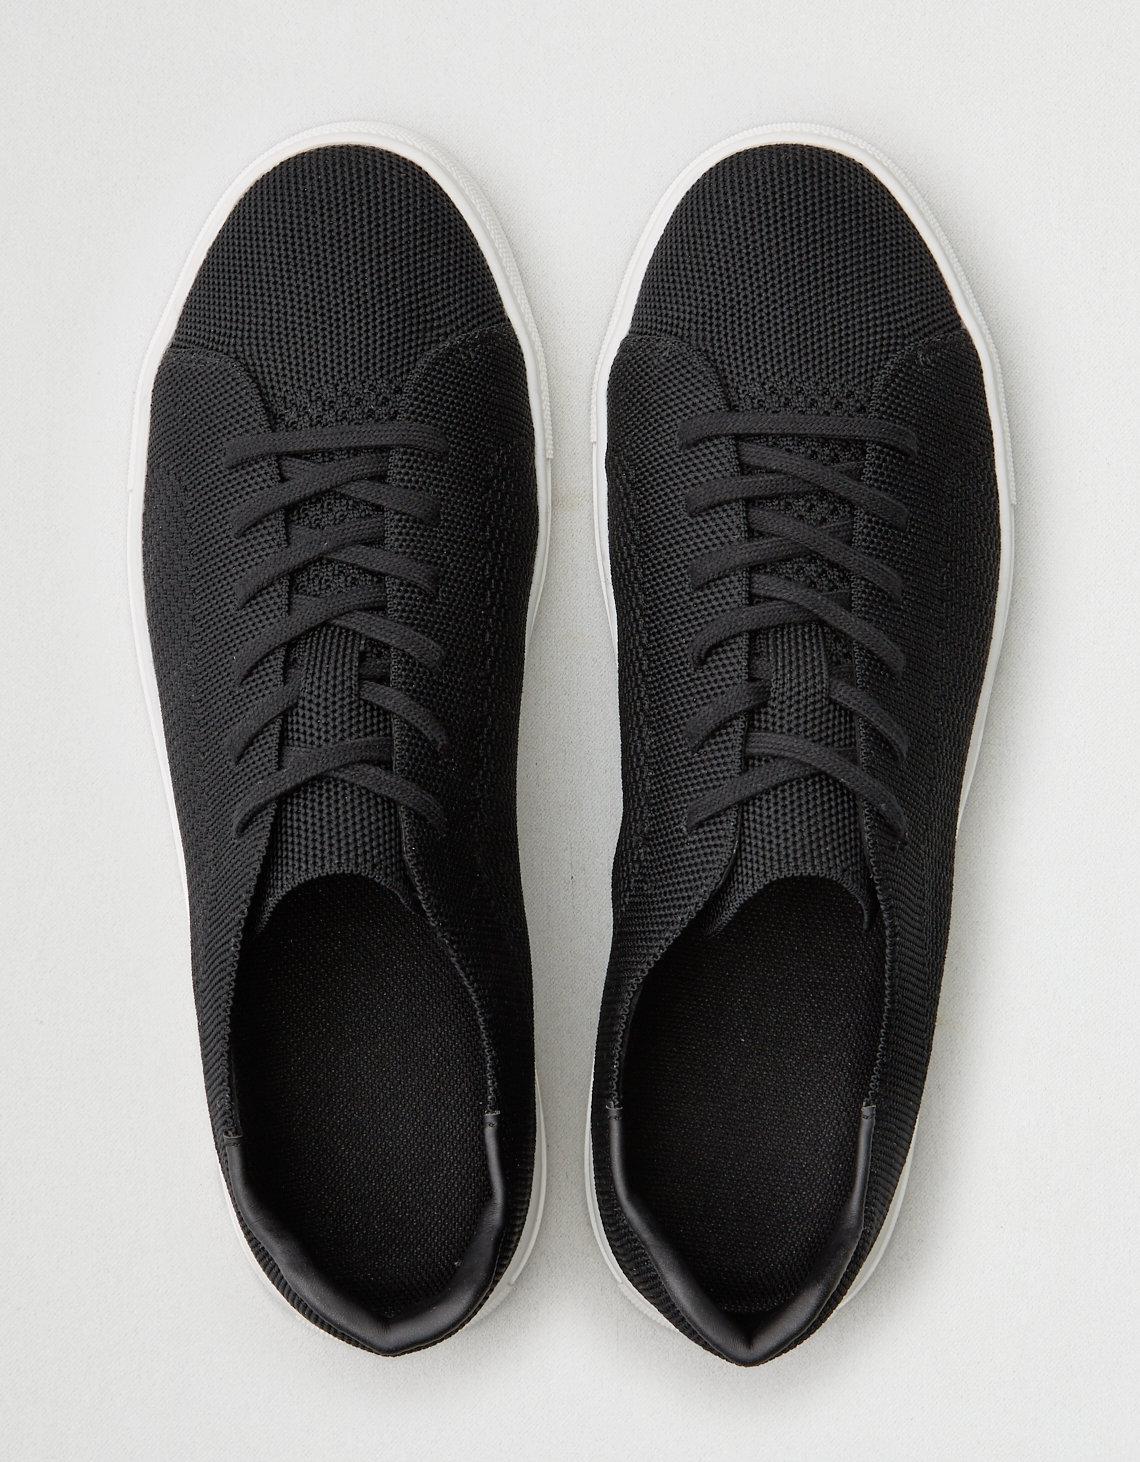 Lyst - American Eagle X-ray Knit Club Sneaker in Black for Men cfe66b631fb